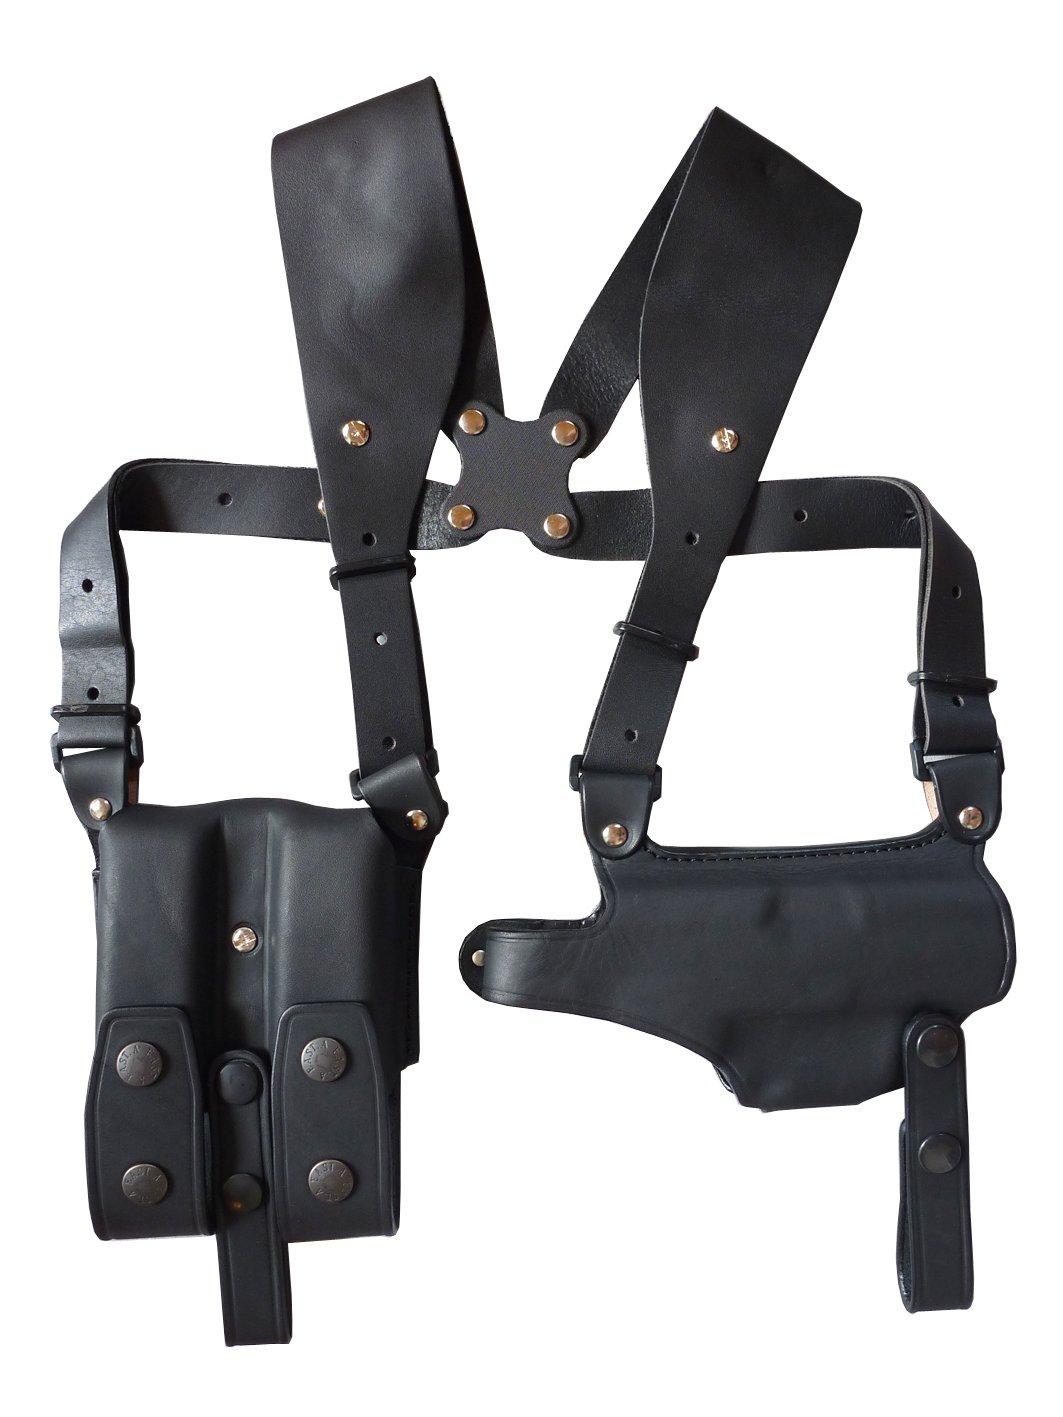 USP//P8 gewidmet horizontale Schulterholster Silhouette No.284-BR Japan Import aus Leder Braun gemacht